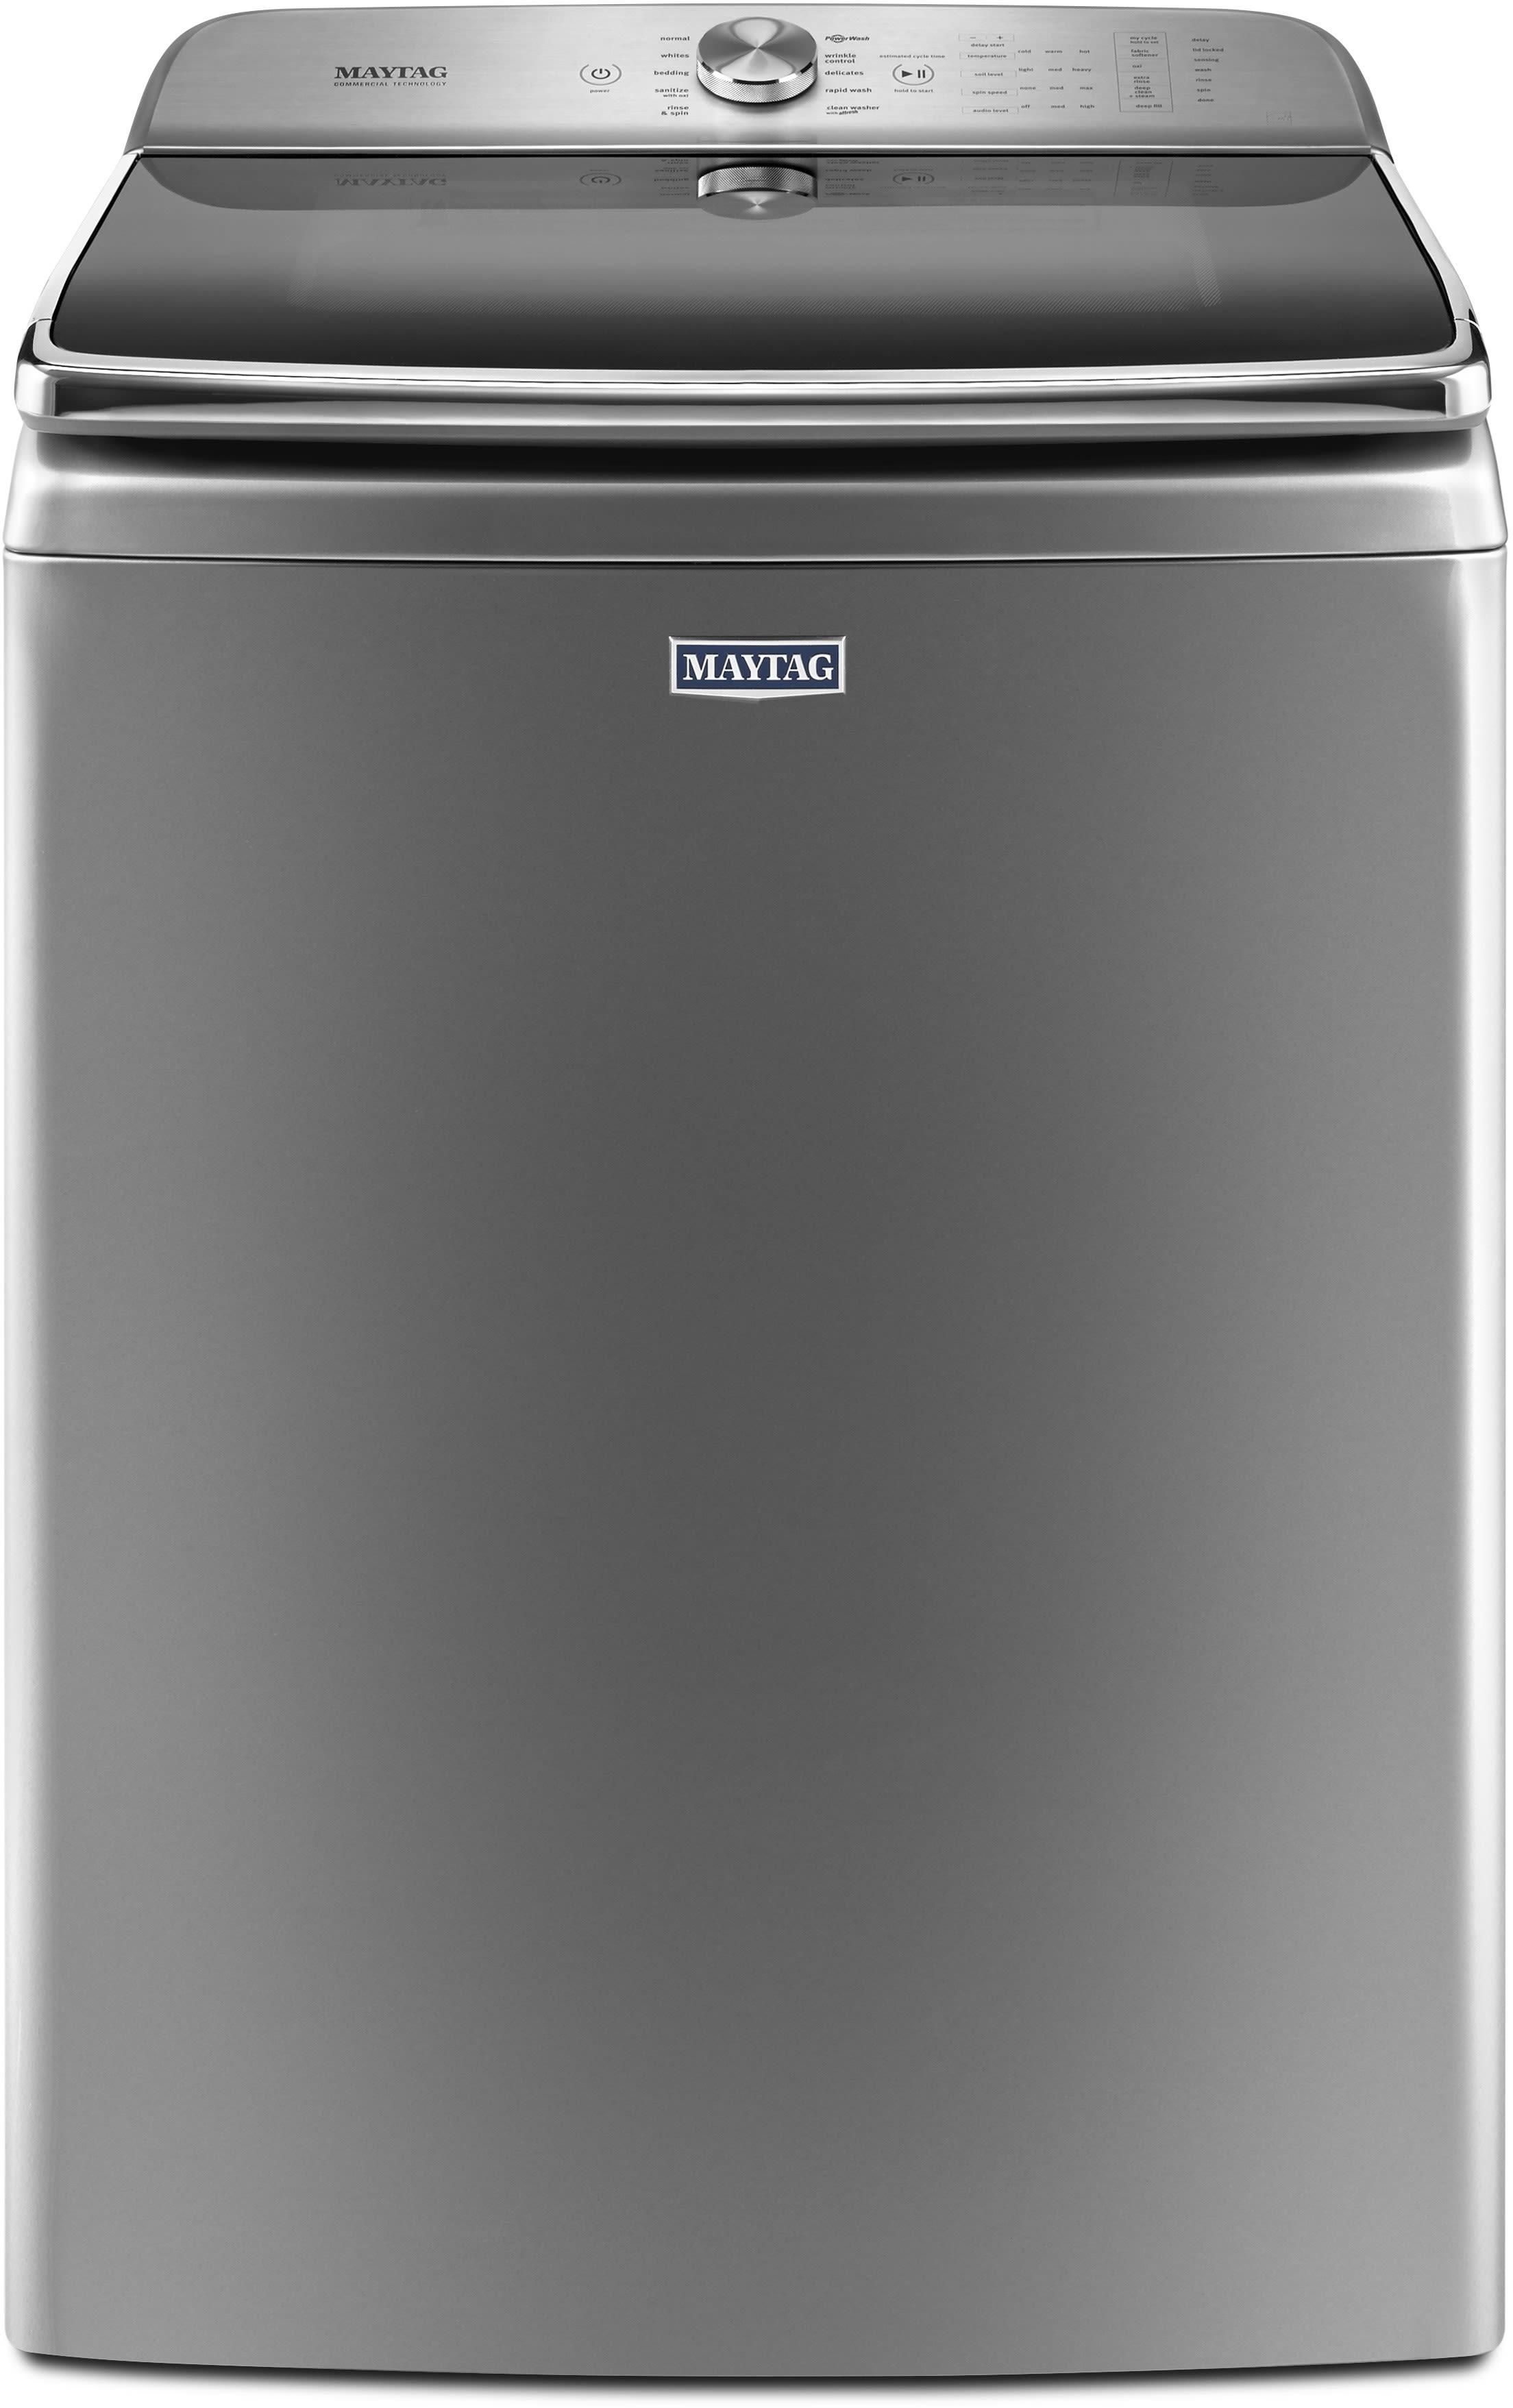 Maytag medb955fc 29 inch electric dryer with 9 2 cu ft capacity steam 10 dry cycle - Maytag whirlpool ...